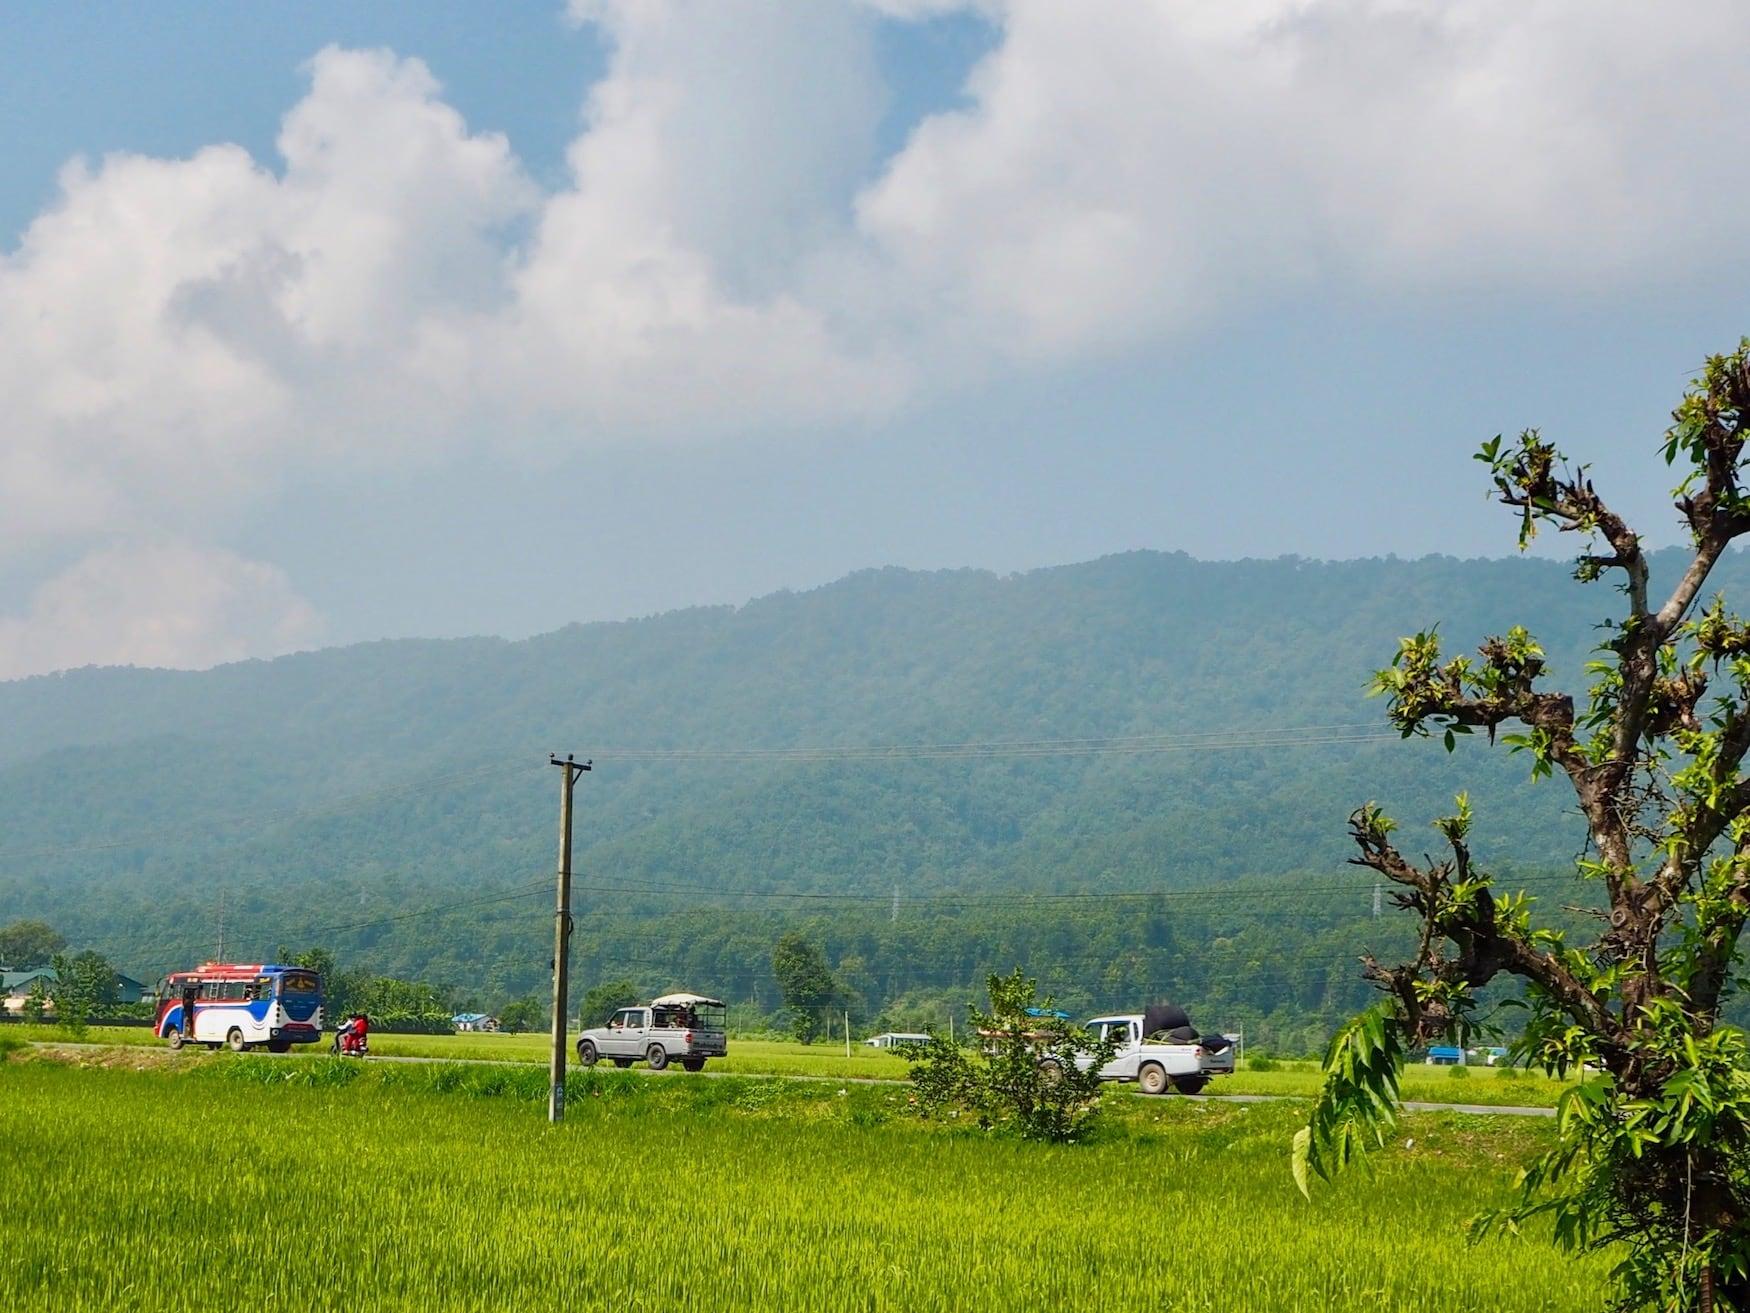 Busfahren in Nepal: Famose Aussichten